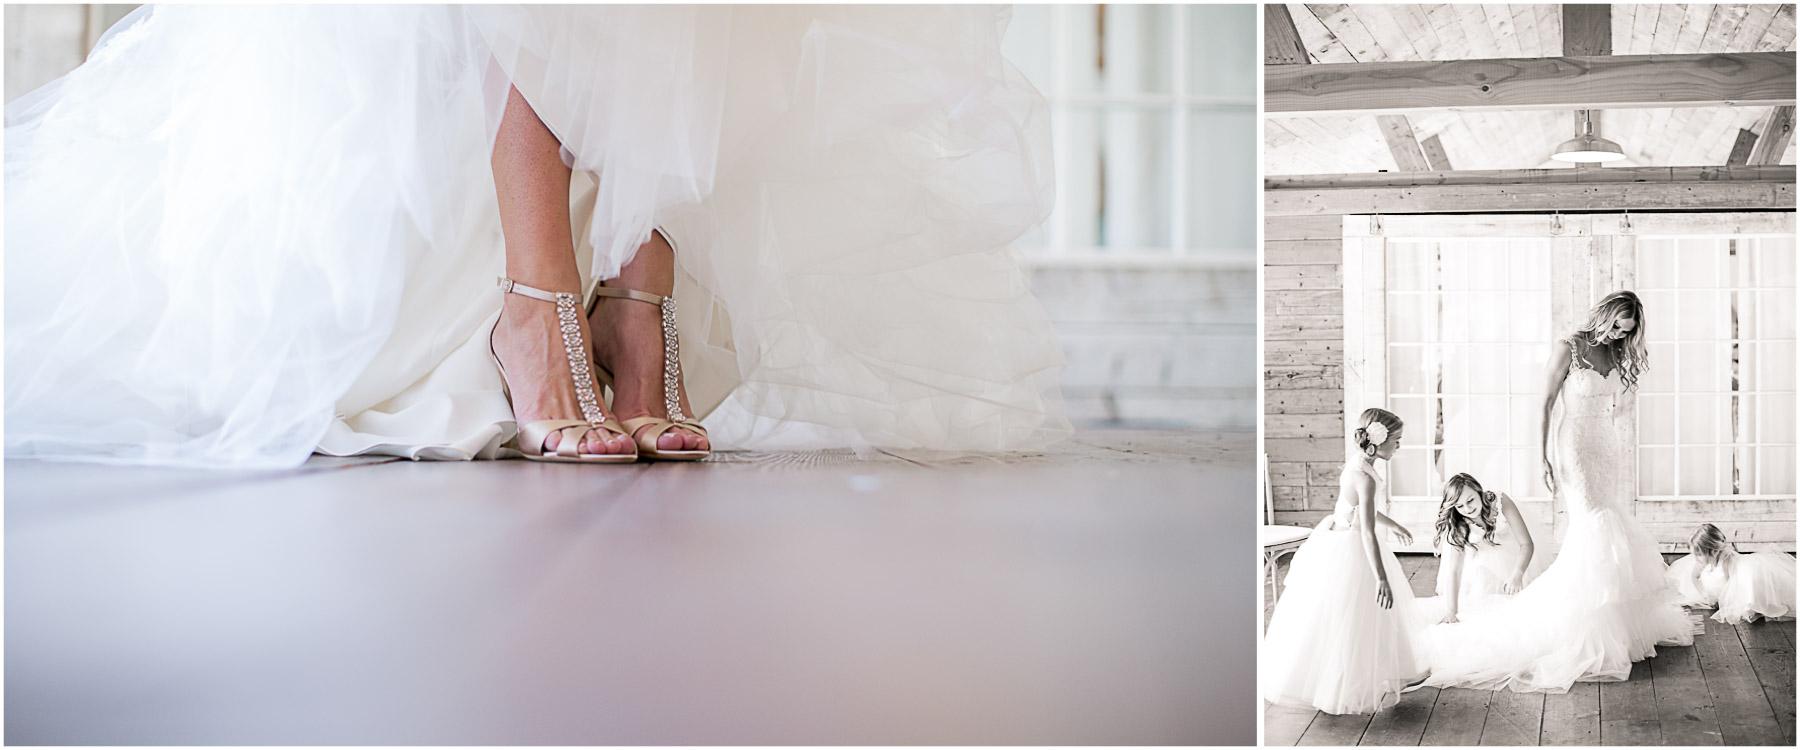 JennaBethPhotography-MEWedding-7.jpg